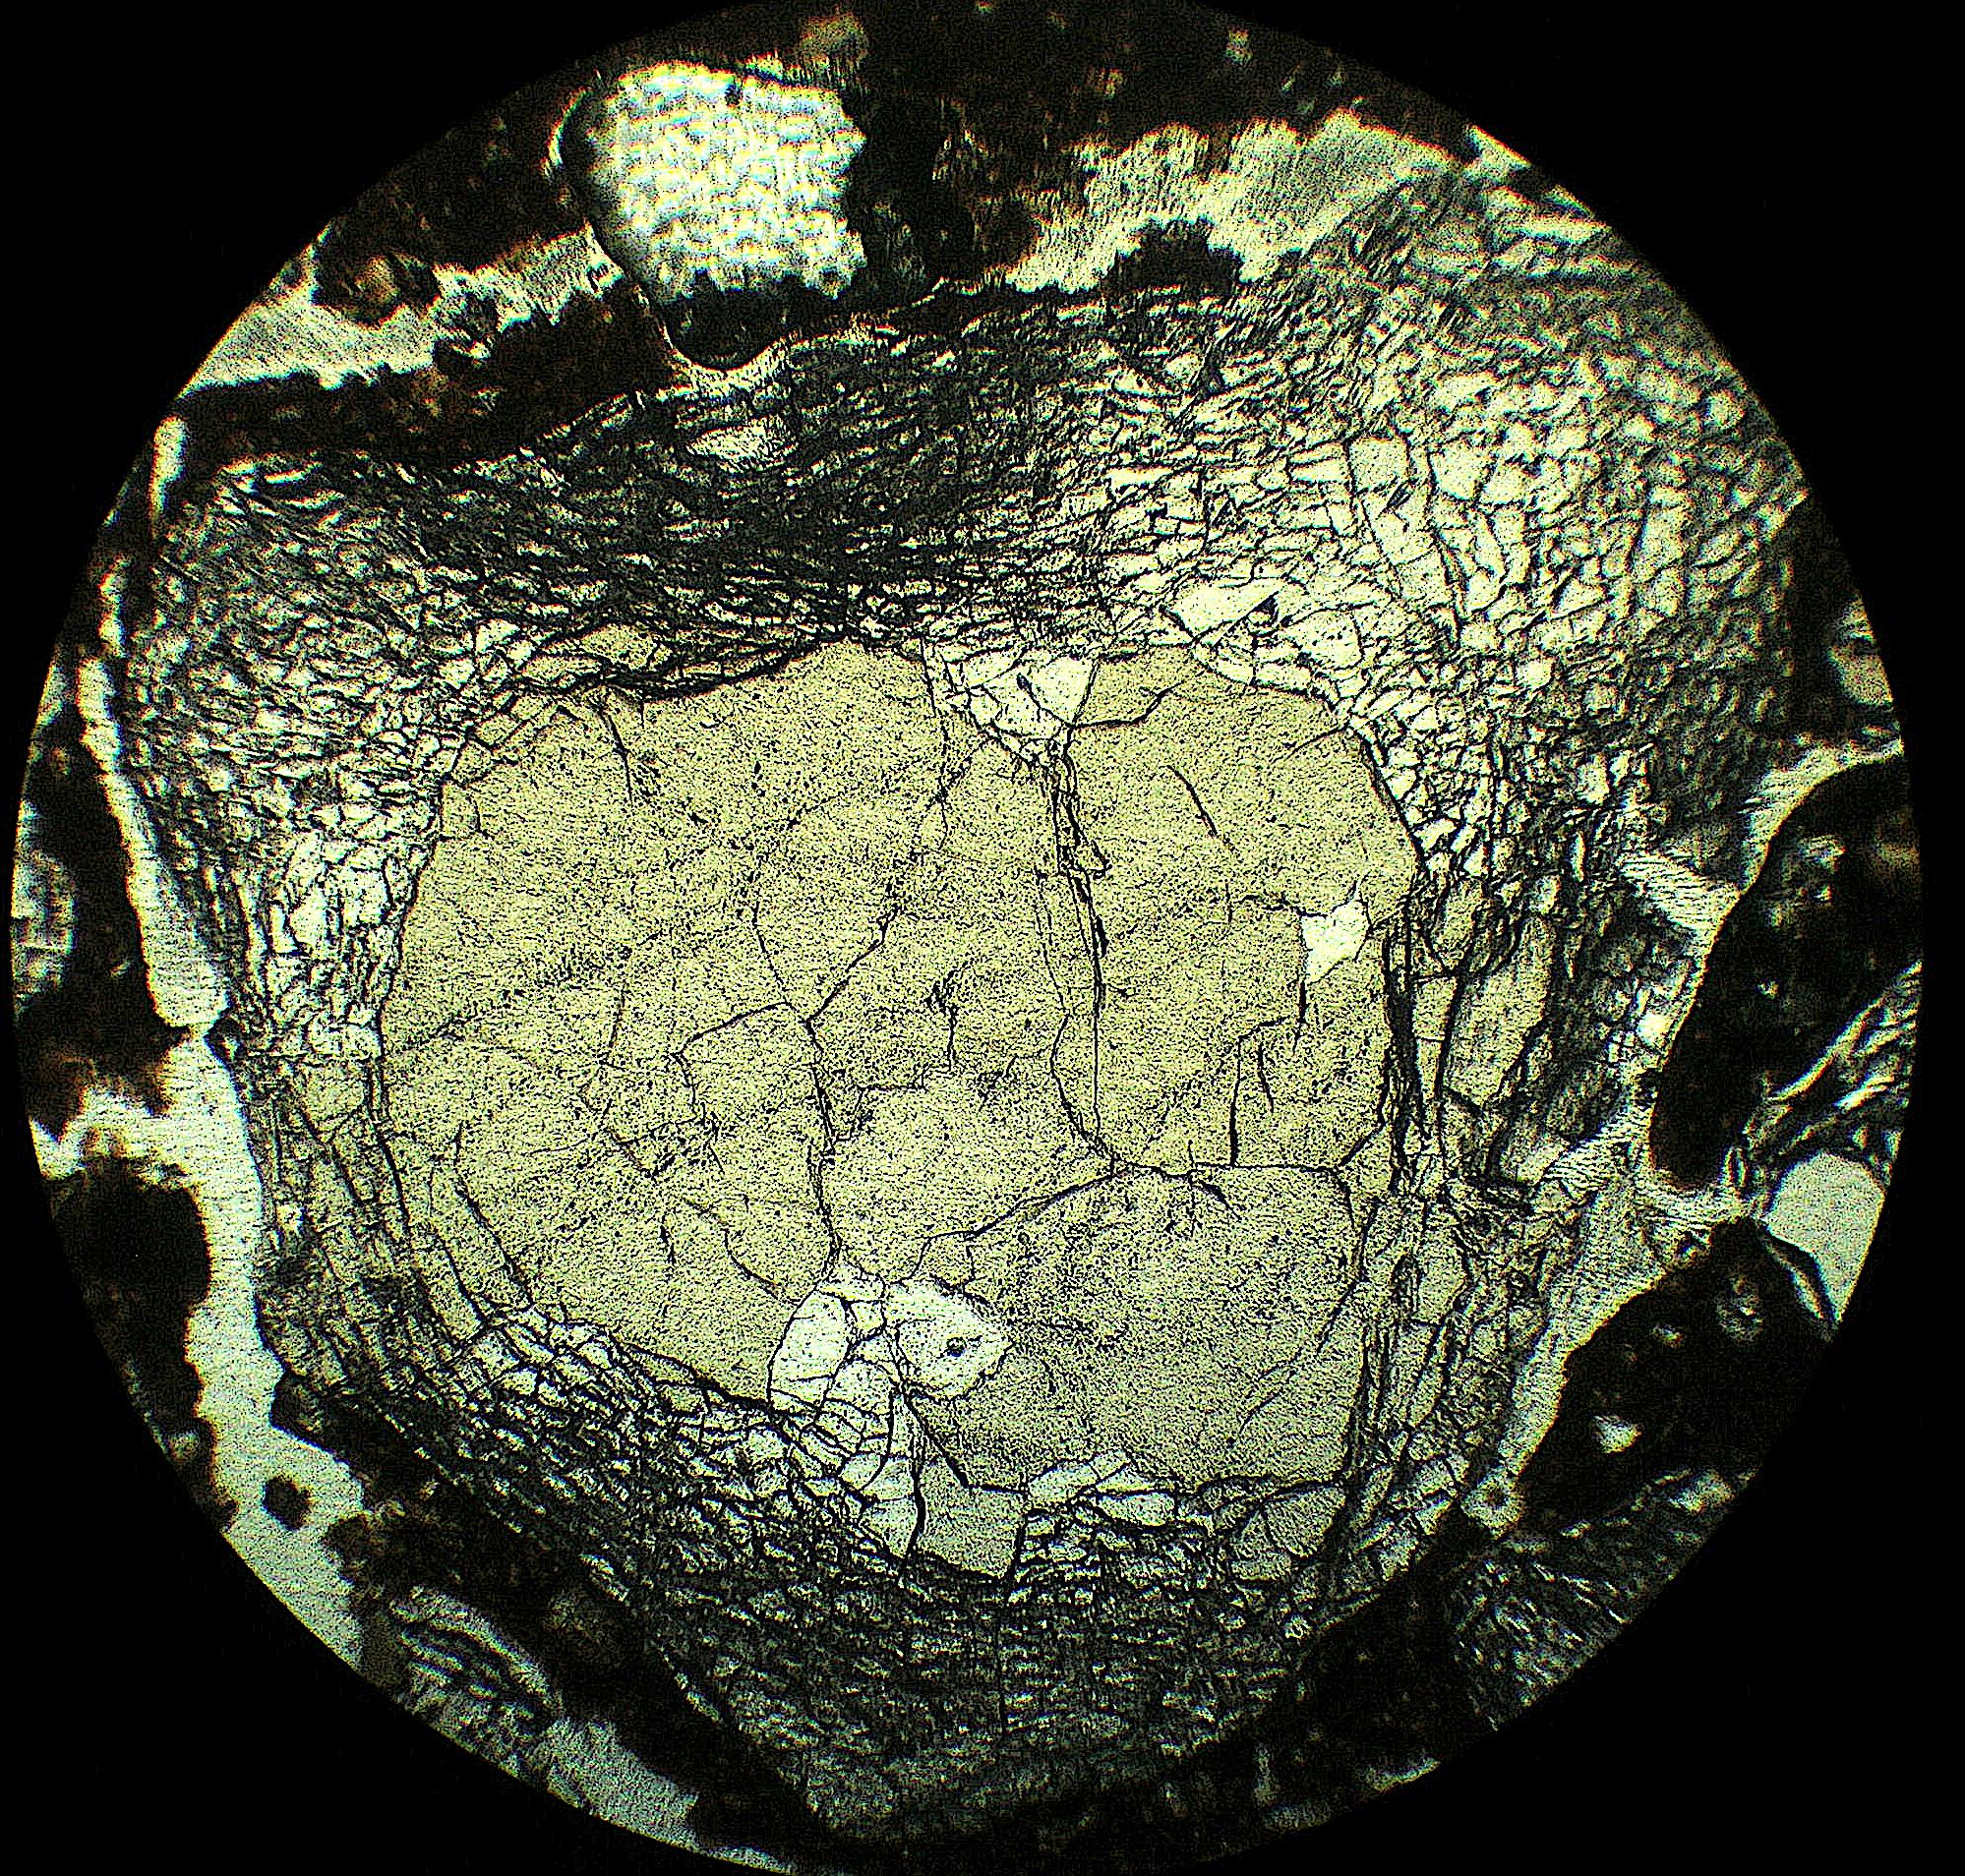 Meteorite impact thermal shock micro-fracturing in quartz